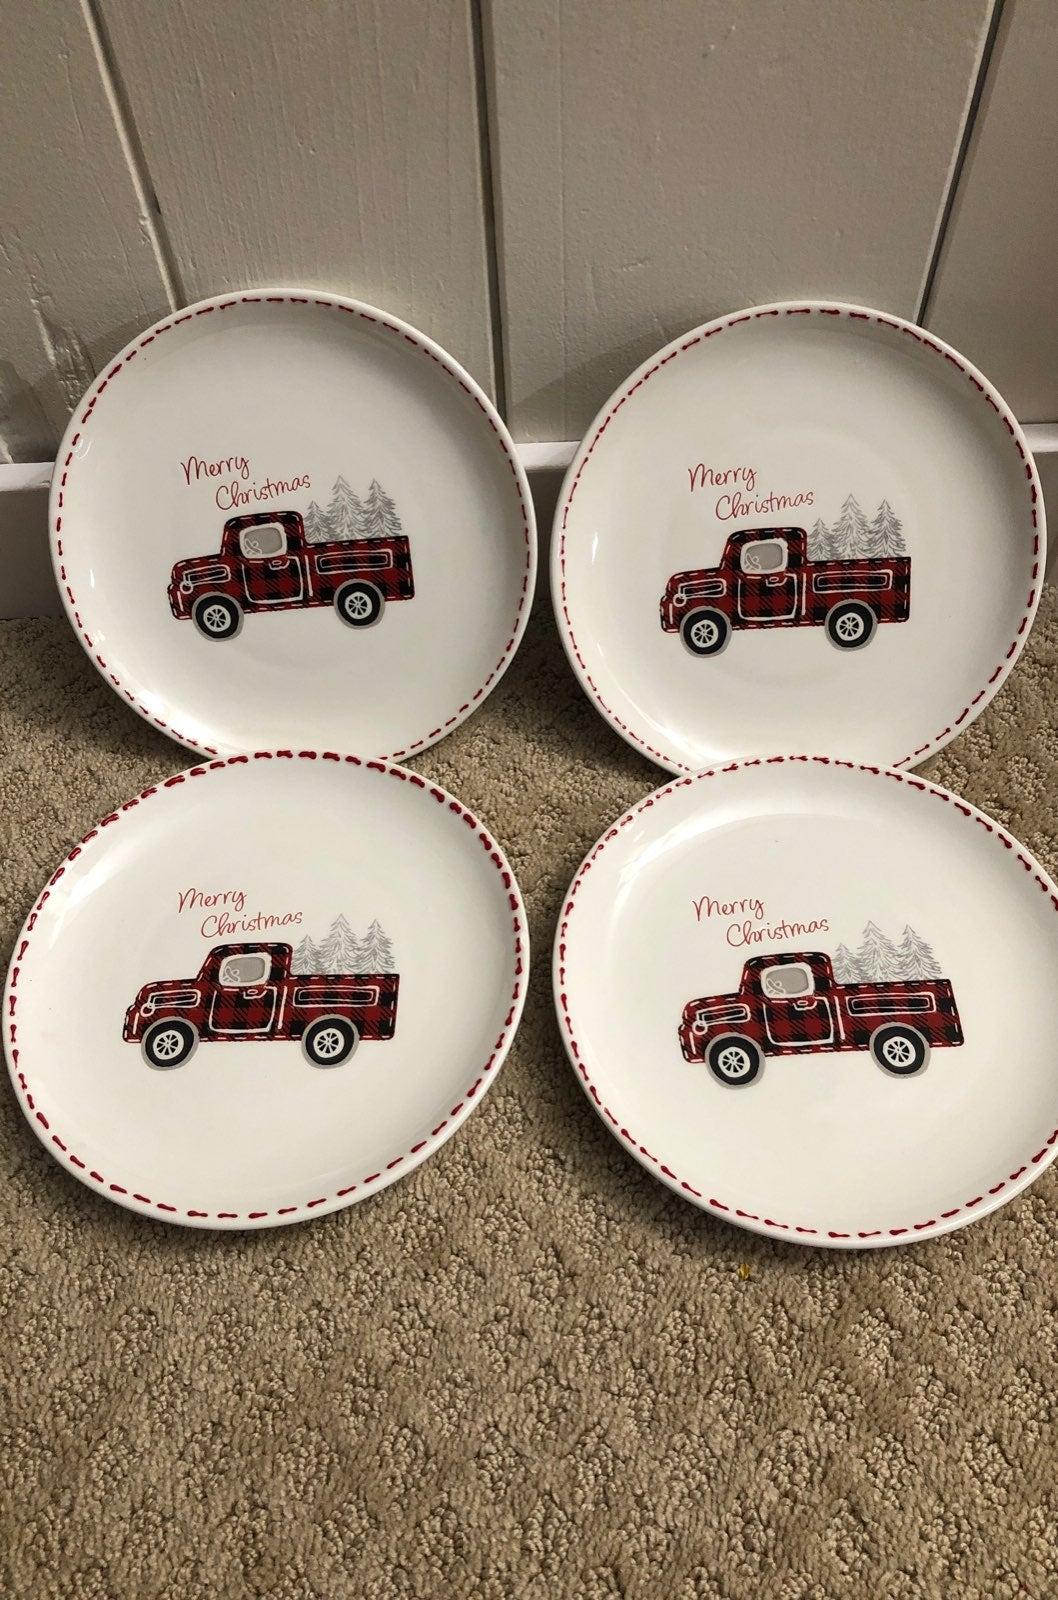 Potter's Studio Holiday Plates Set